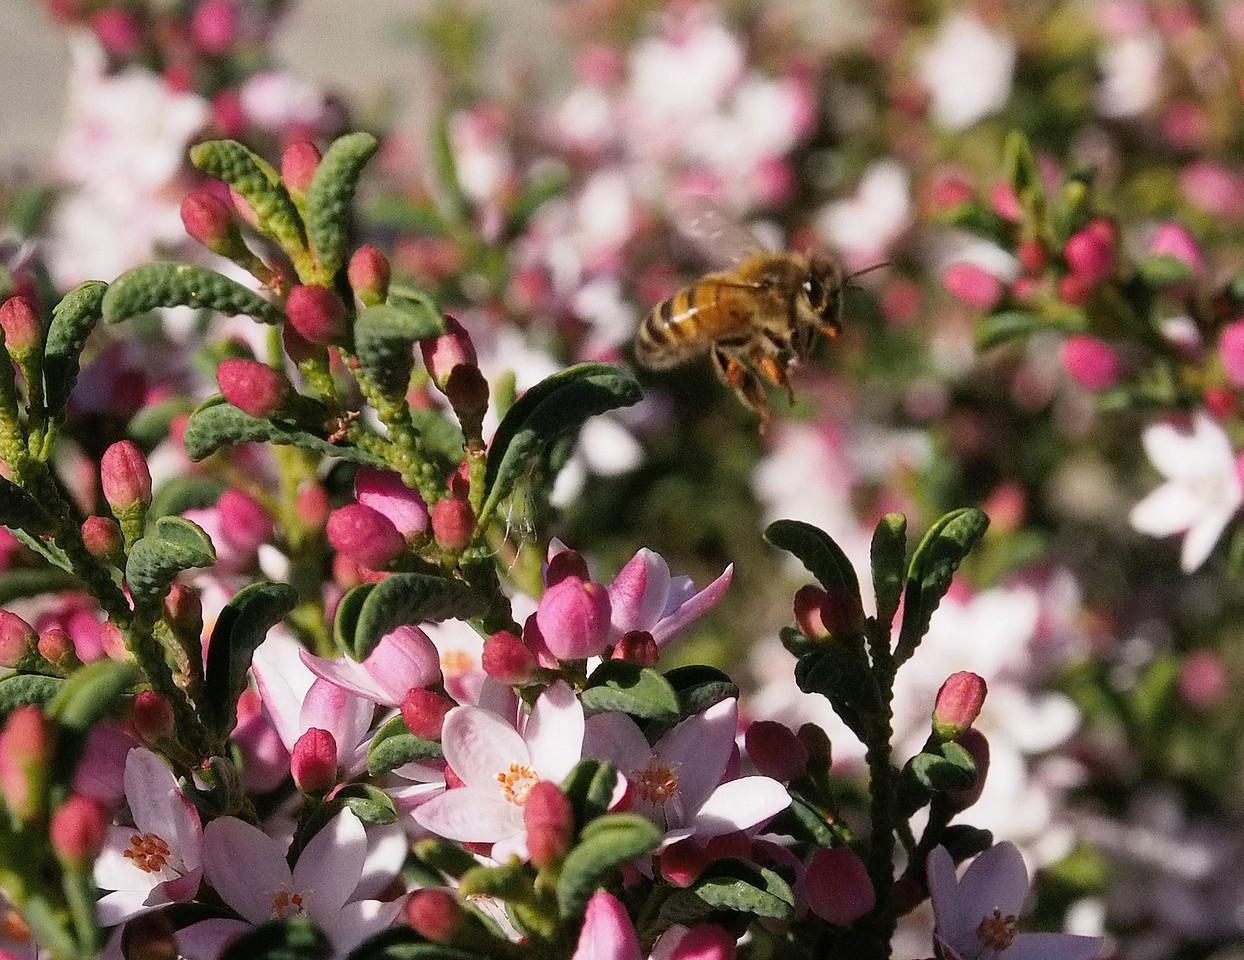 20130811_1330_0155 Kew Baptist bee